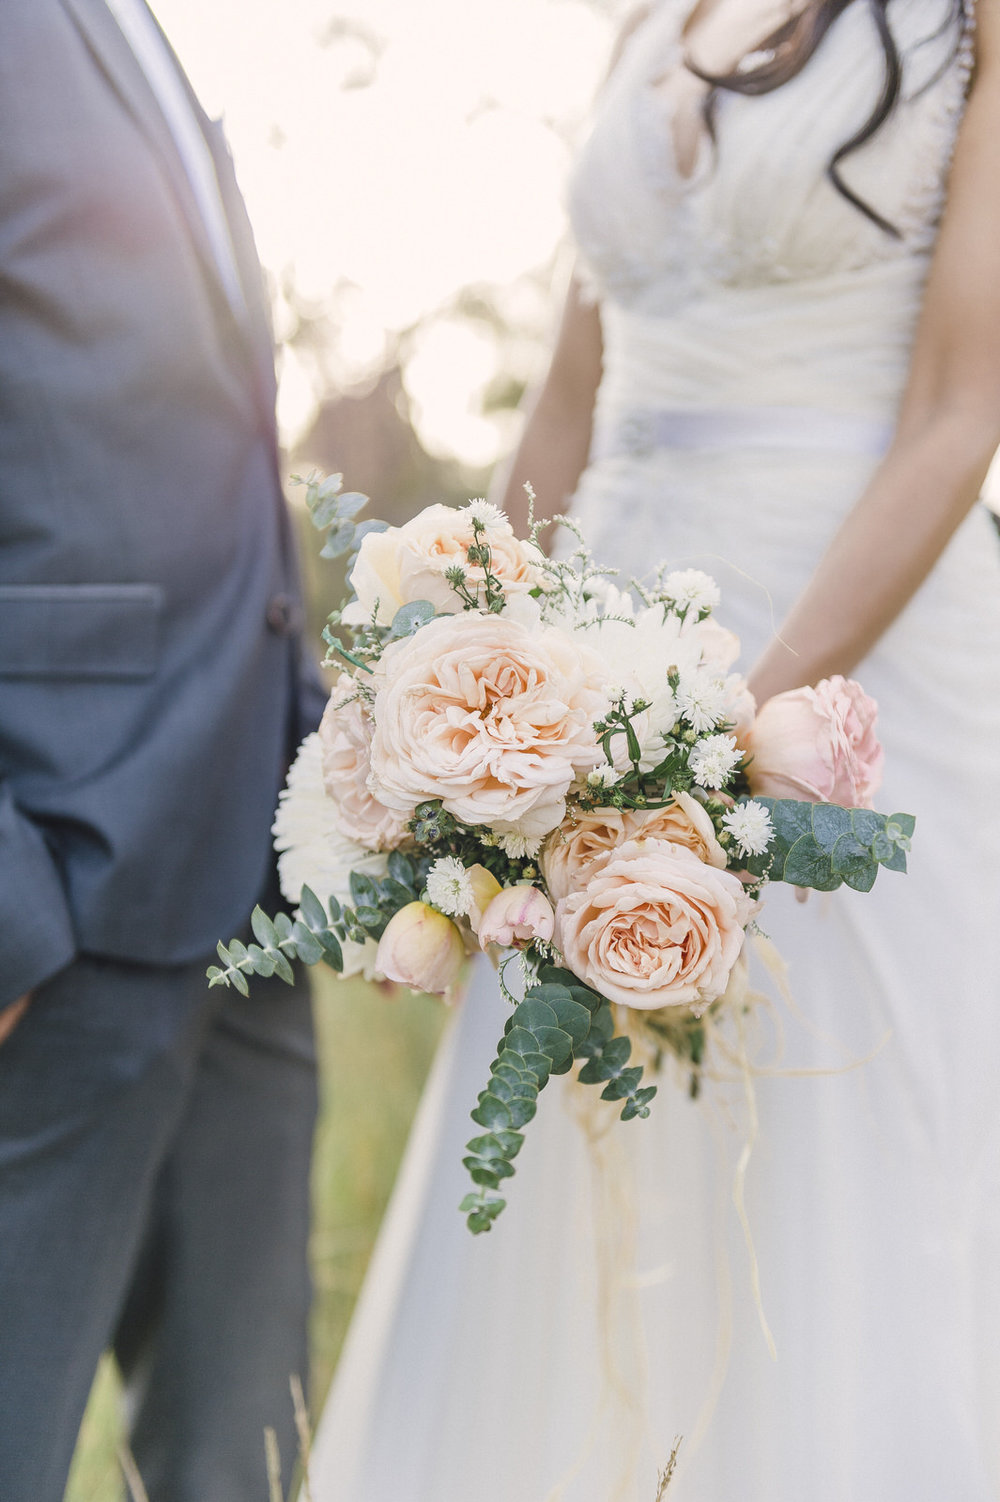 RyanParker_FineArtPhotographer_Wedding_Capetown_DSC_1522.jpg